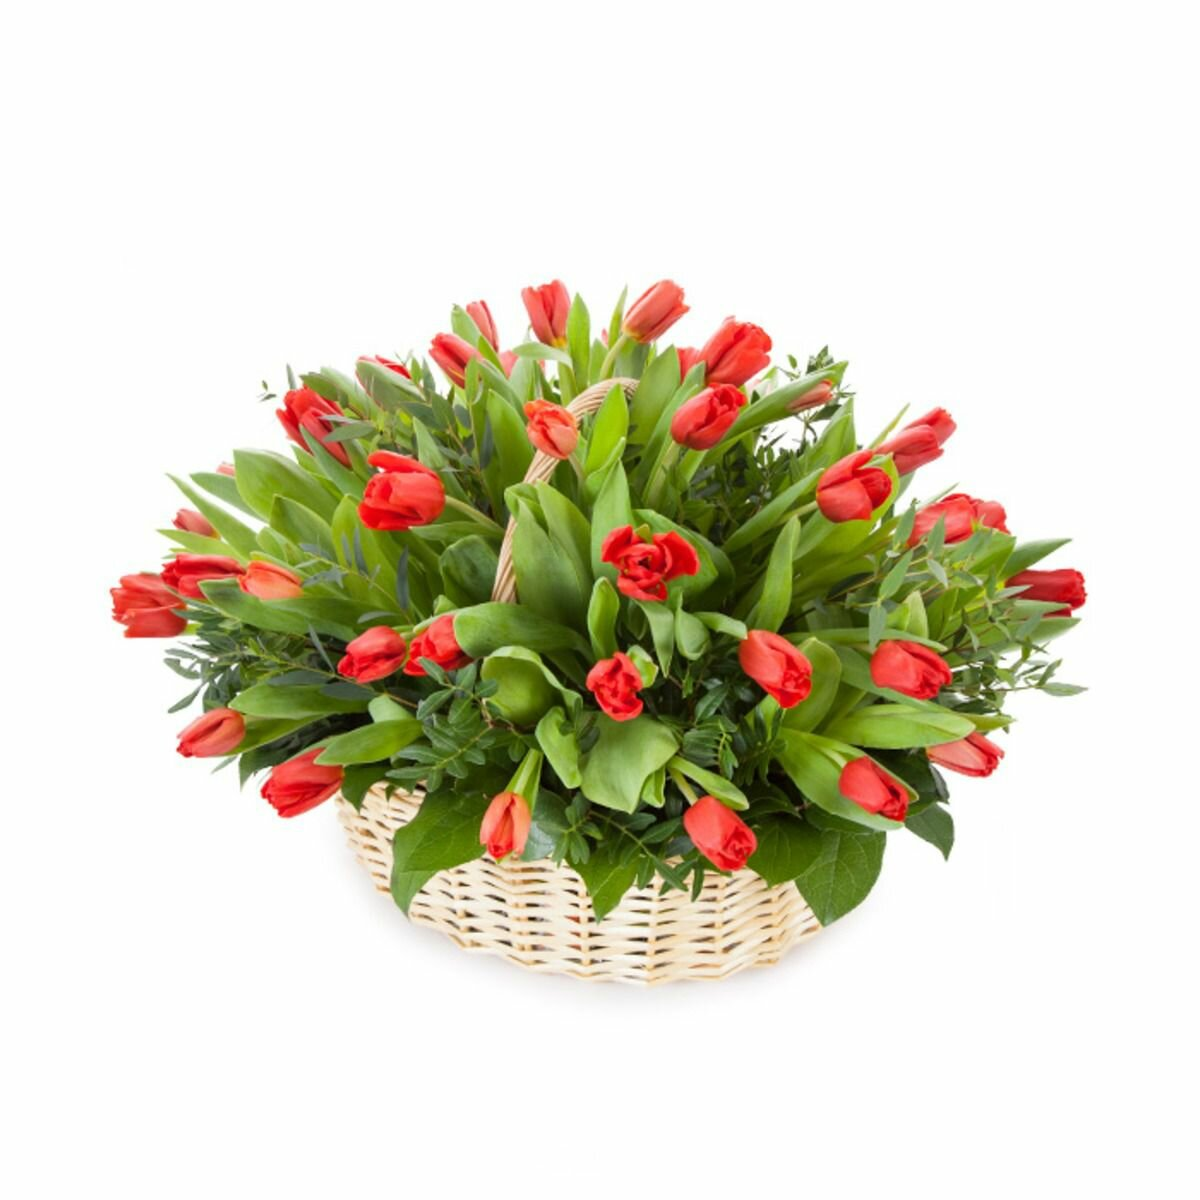 Цветы москве, заказать цветы к празднику 8 марта